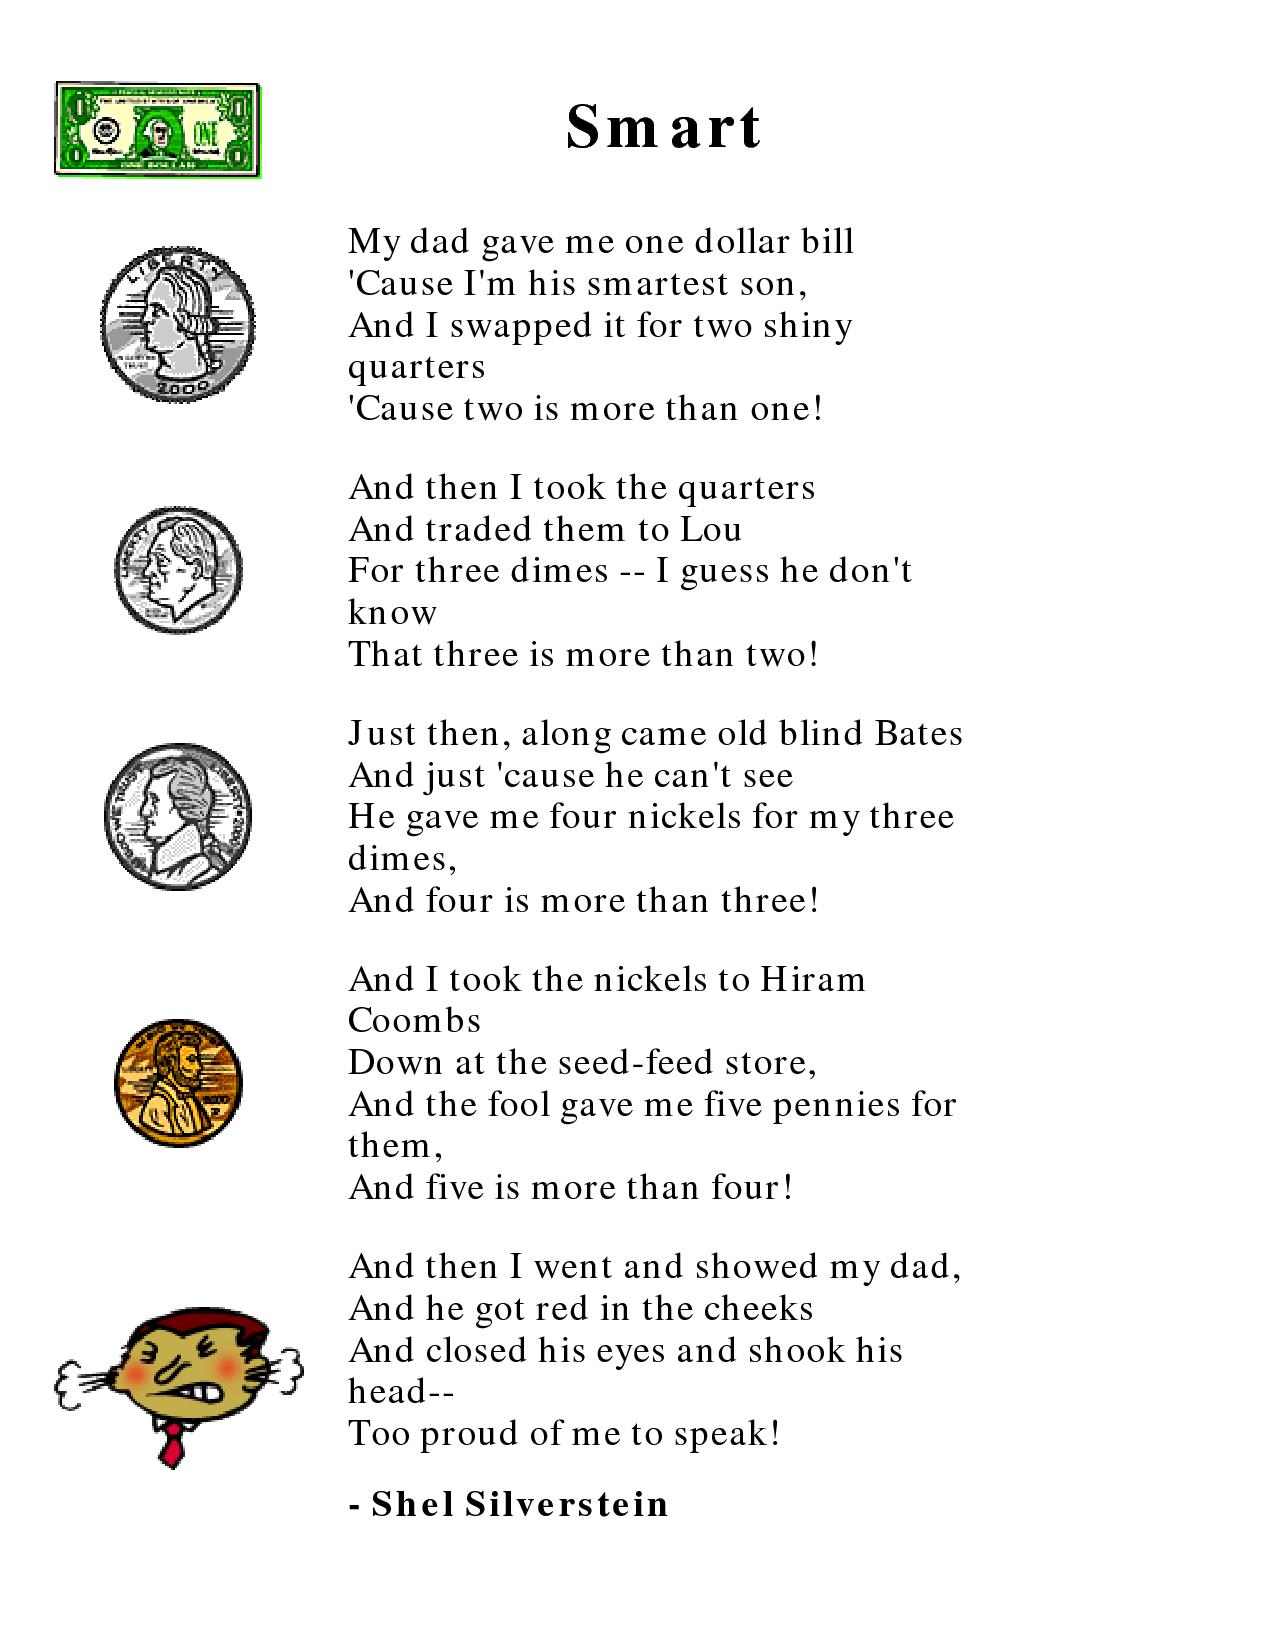 Shel Silverstein Poems Quotes Pinterest Shel Silverstein Poems